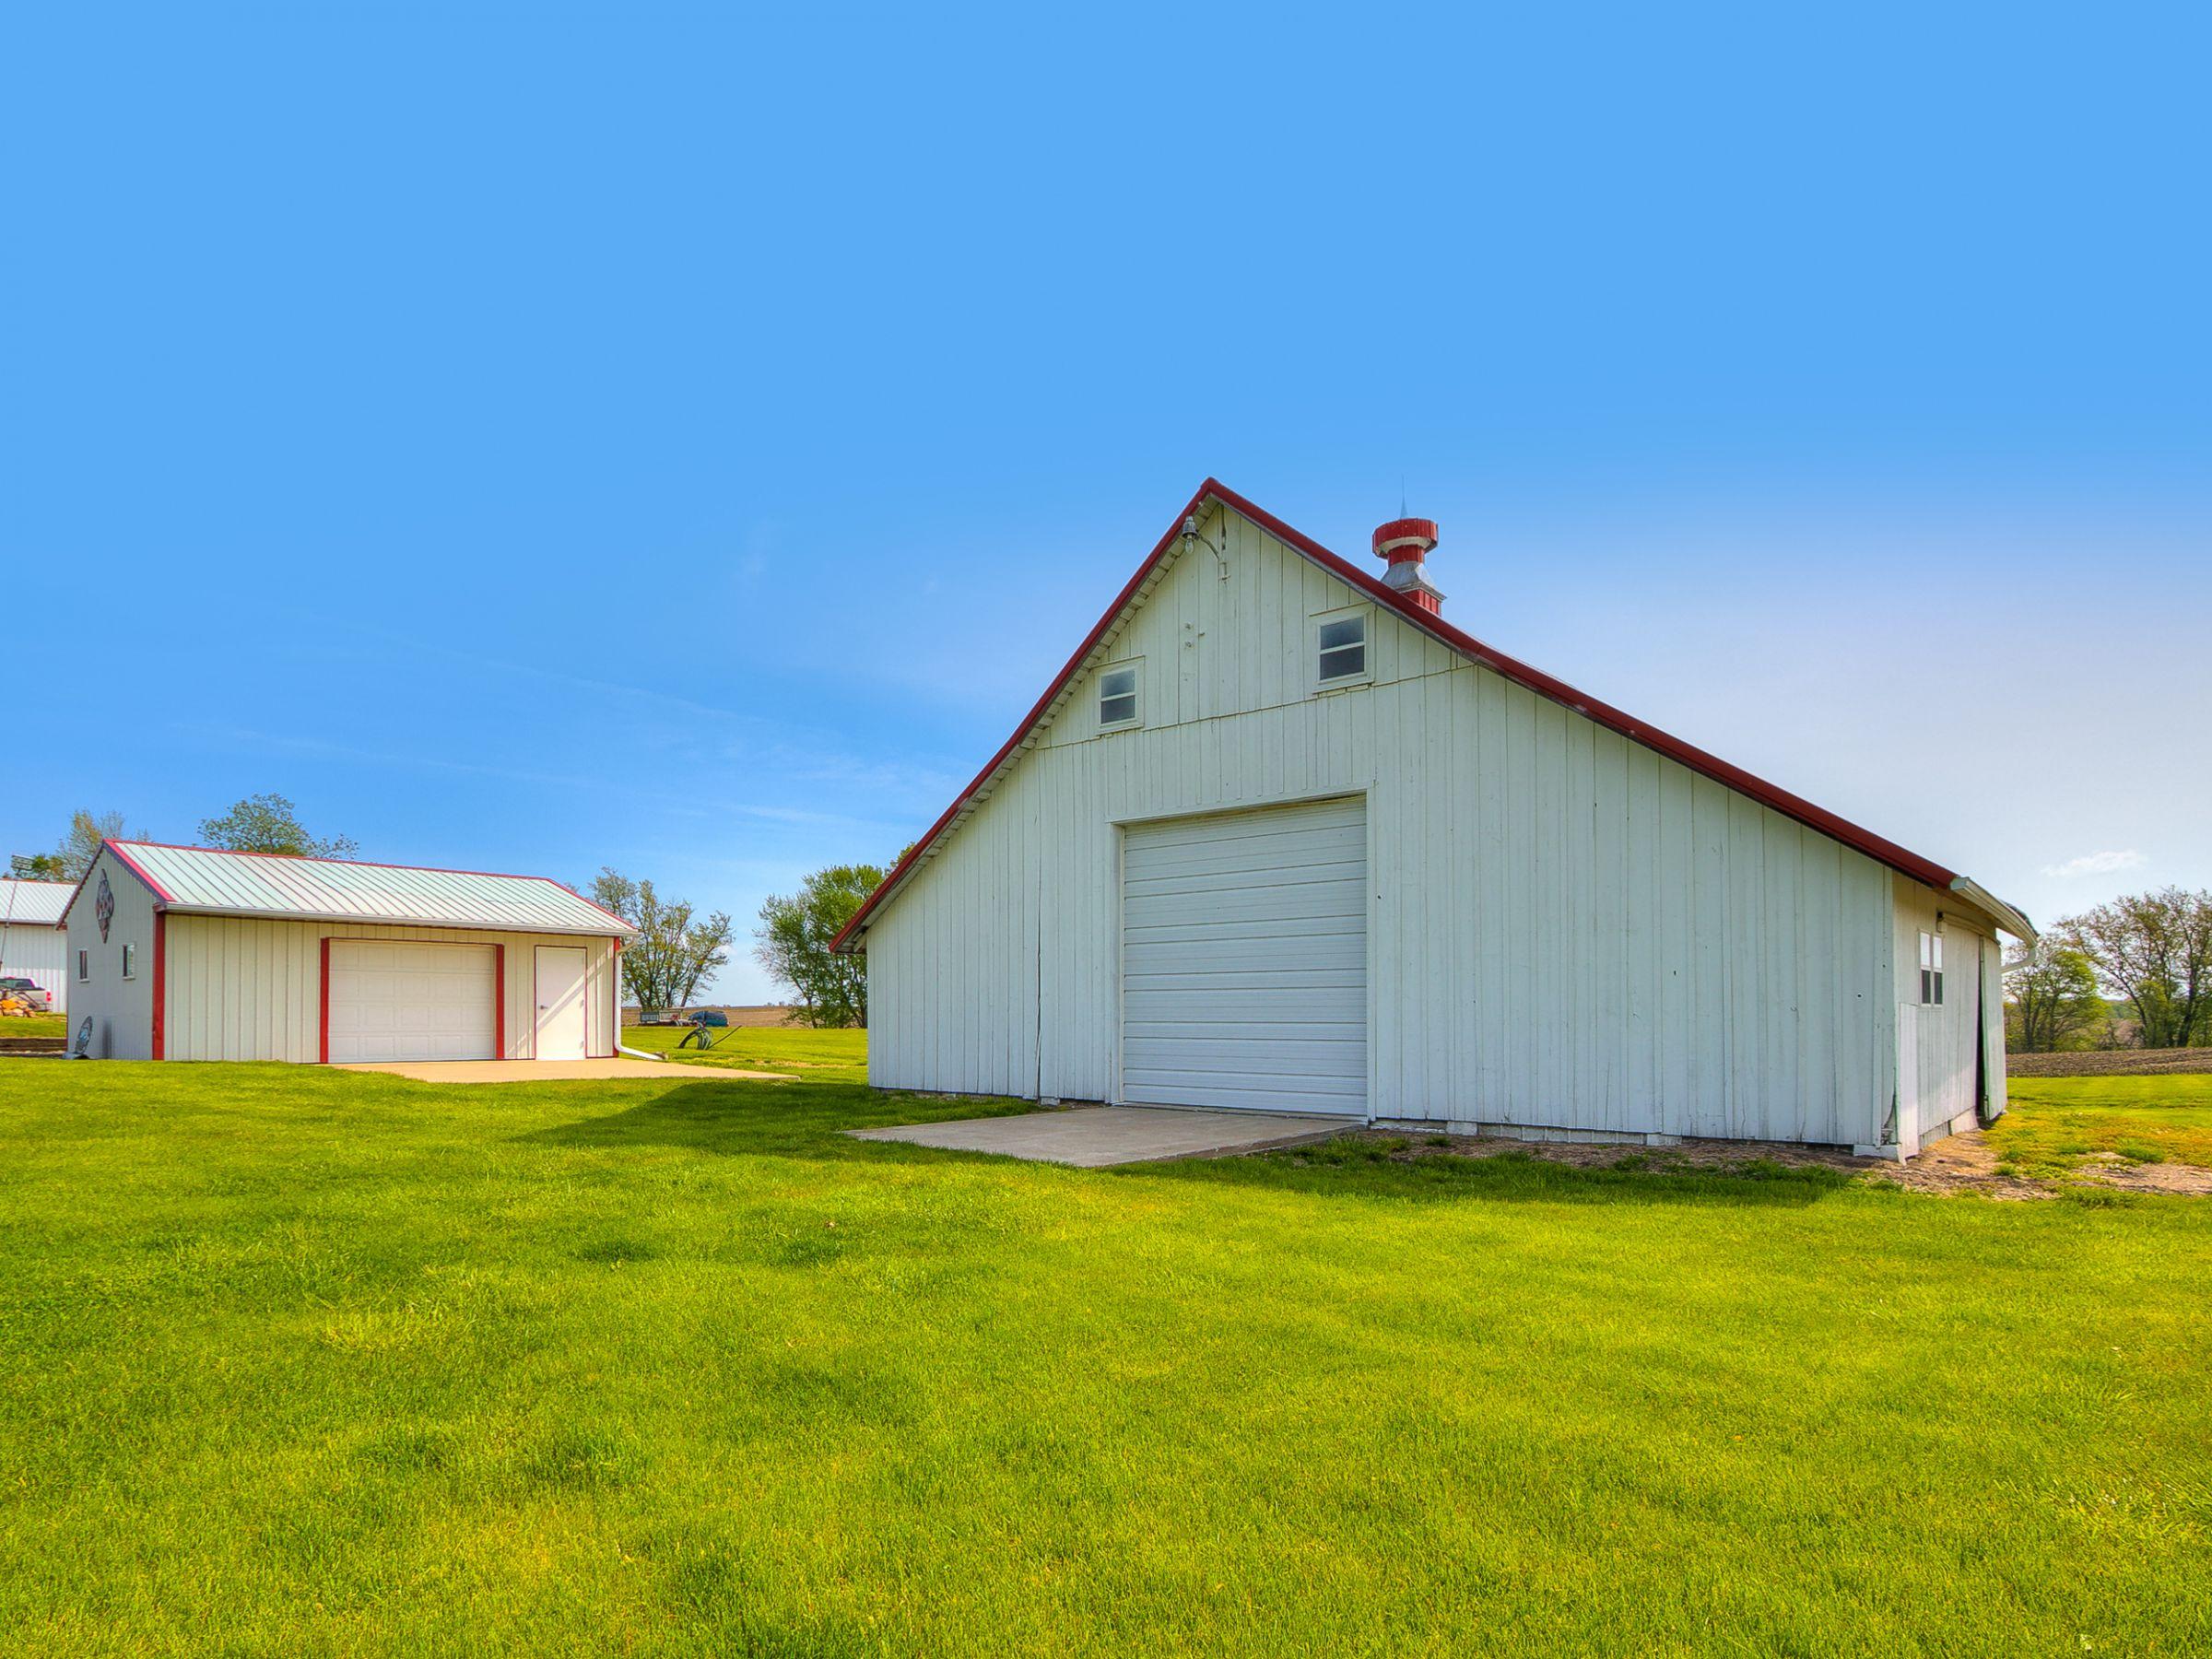 residential-warren-county-iowa-3-acres-listing-number-15516-3-2021-05-12-144748.jpg